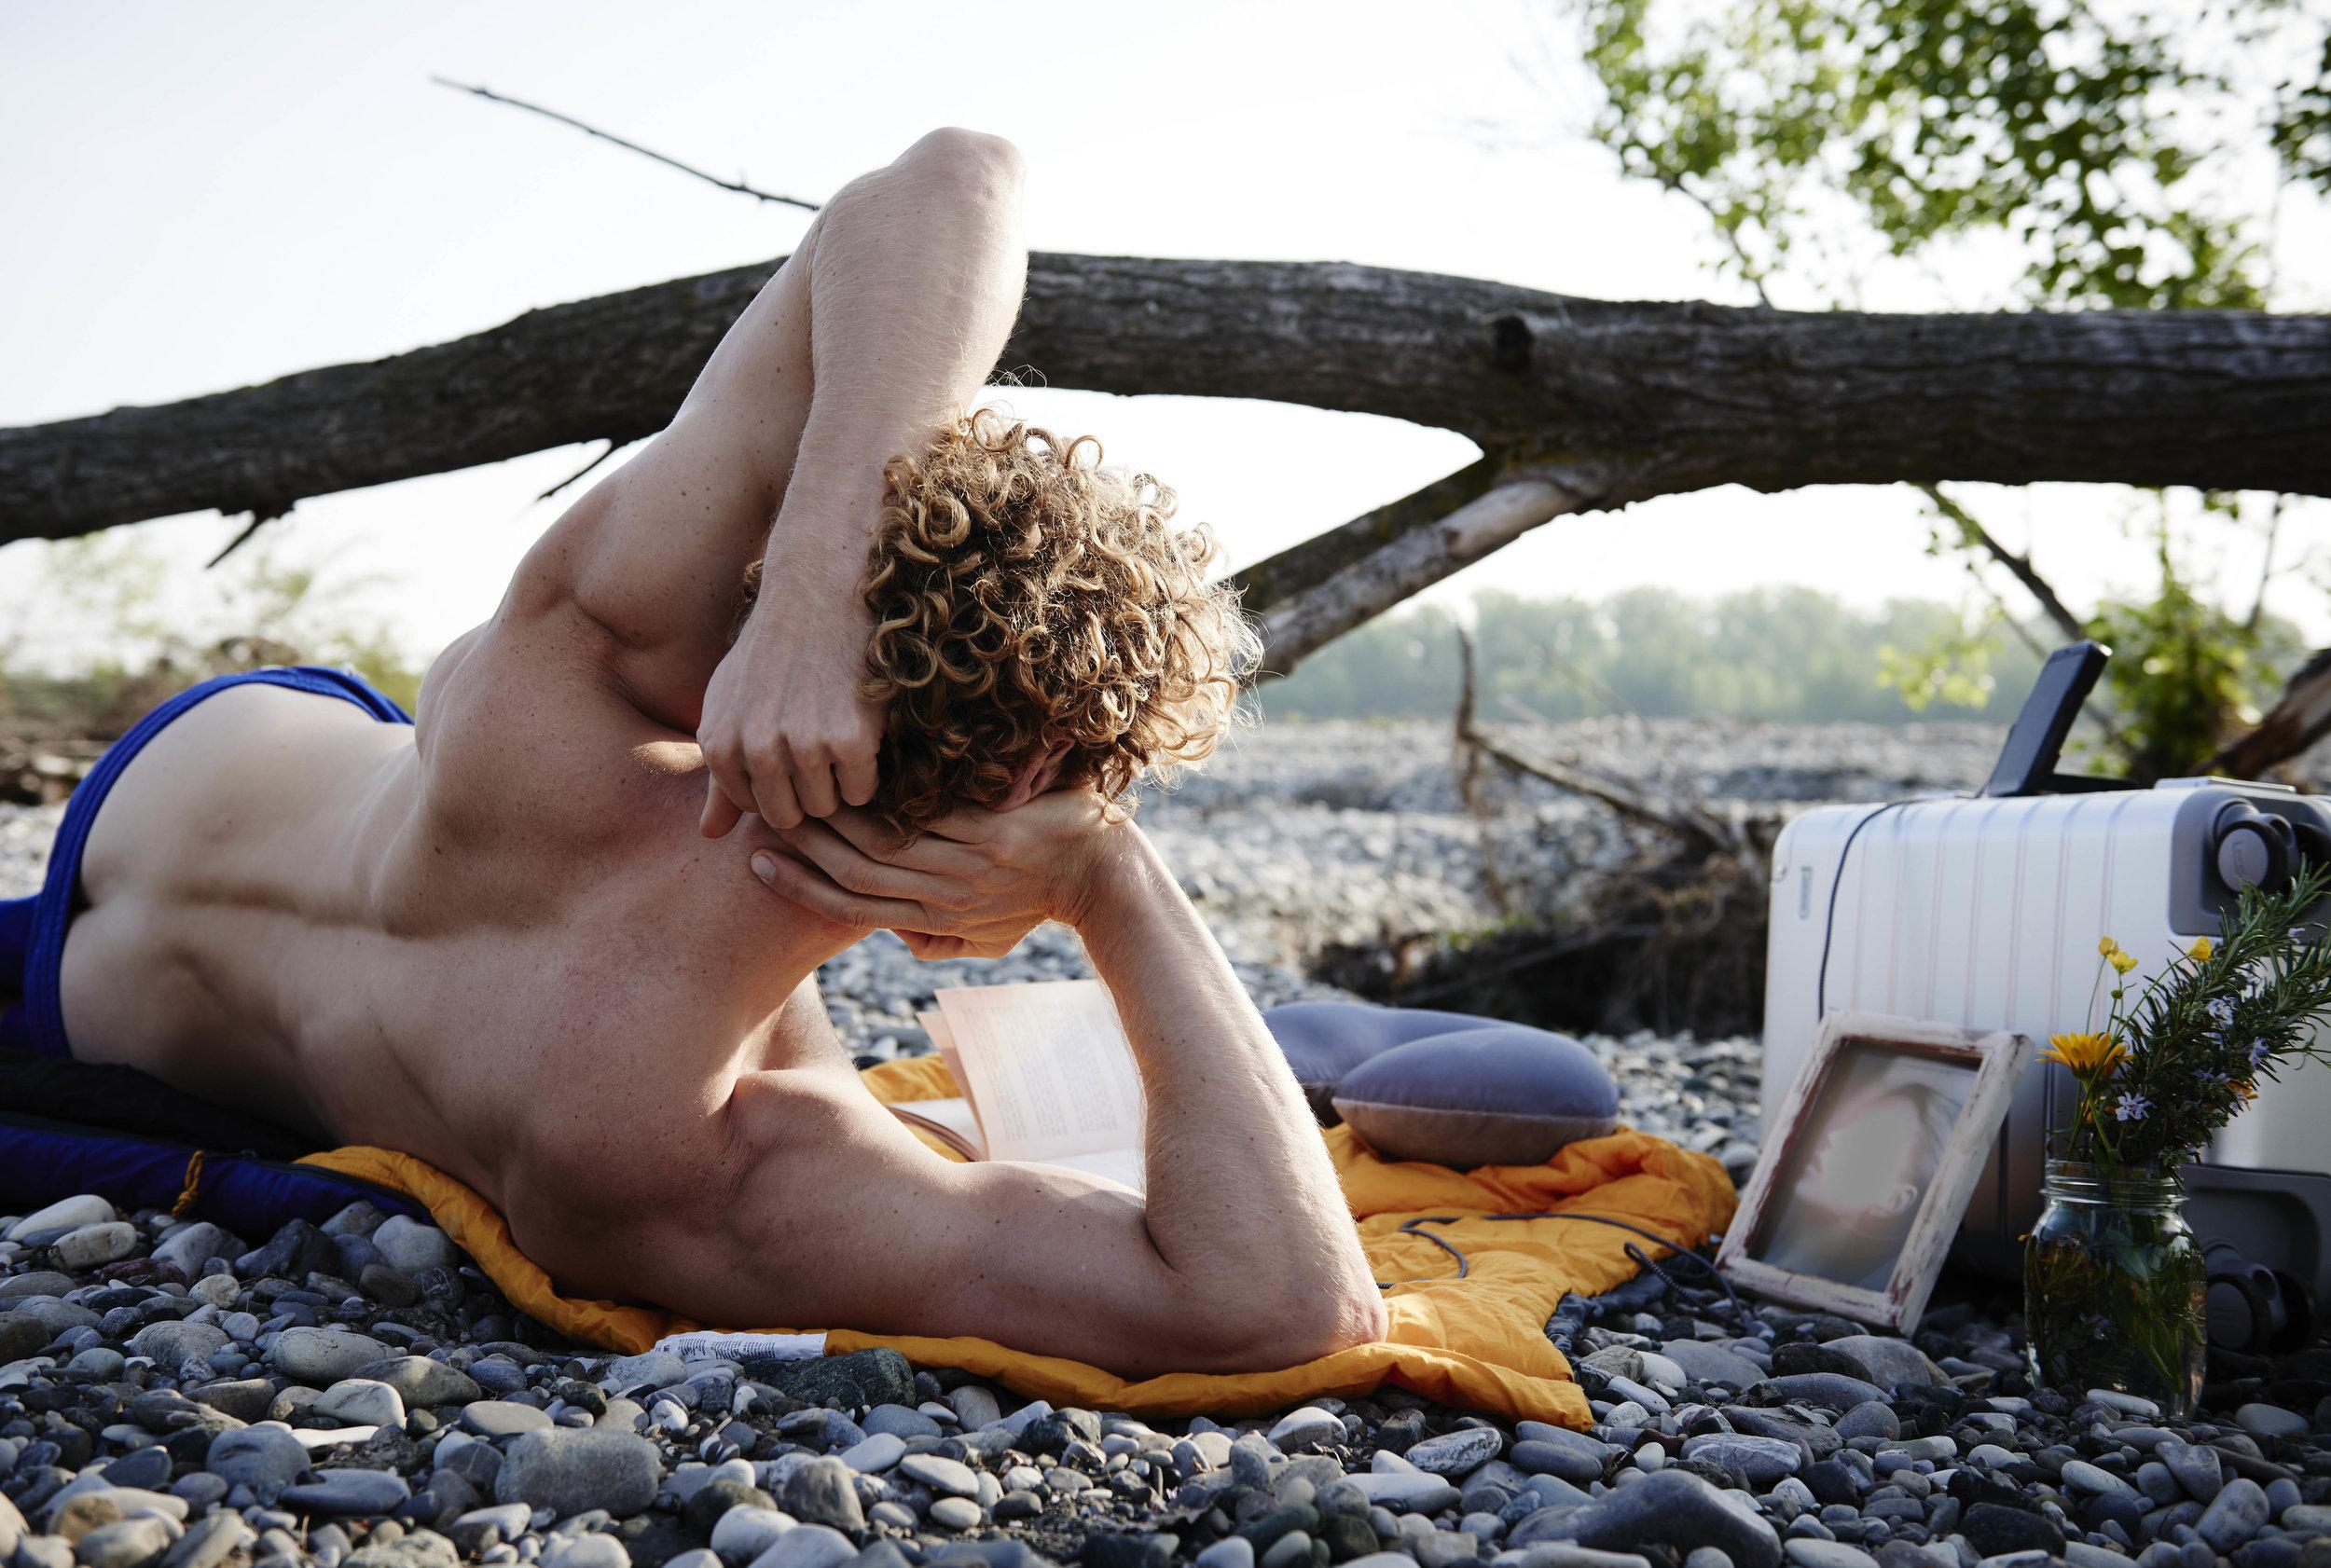 sweatpants  Andrea Pompilio  suitcase  Away